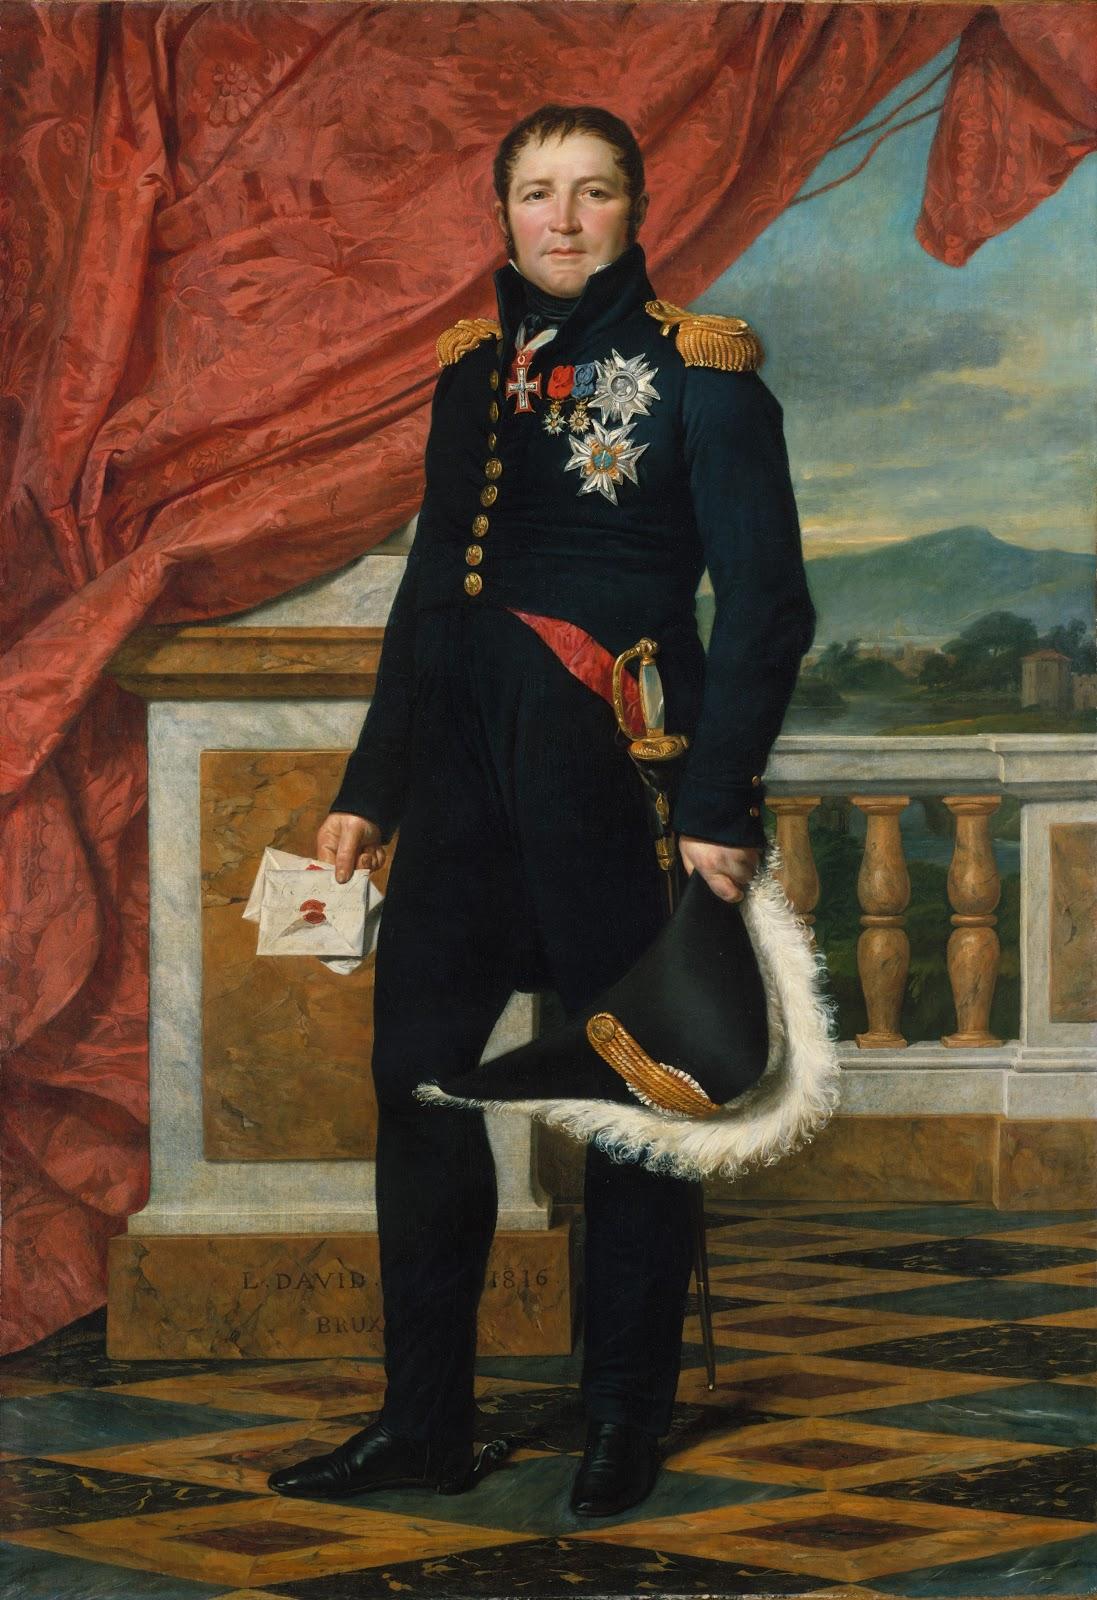 Étienne Maurice Gérard. 1816